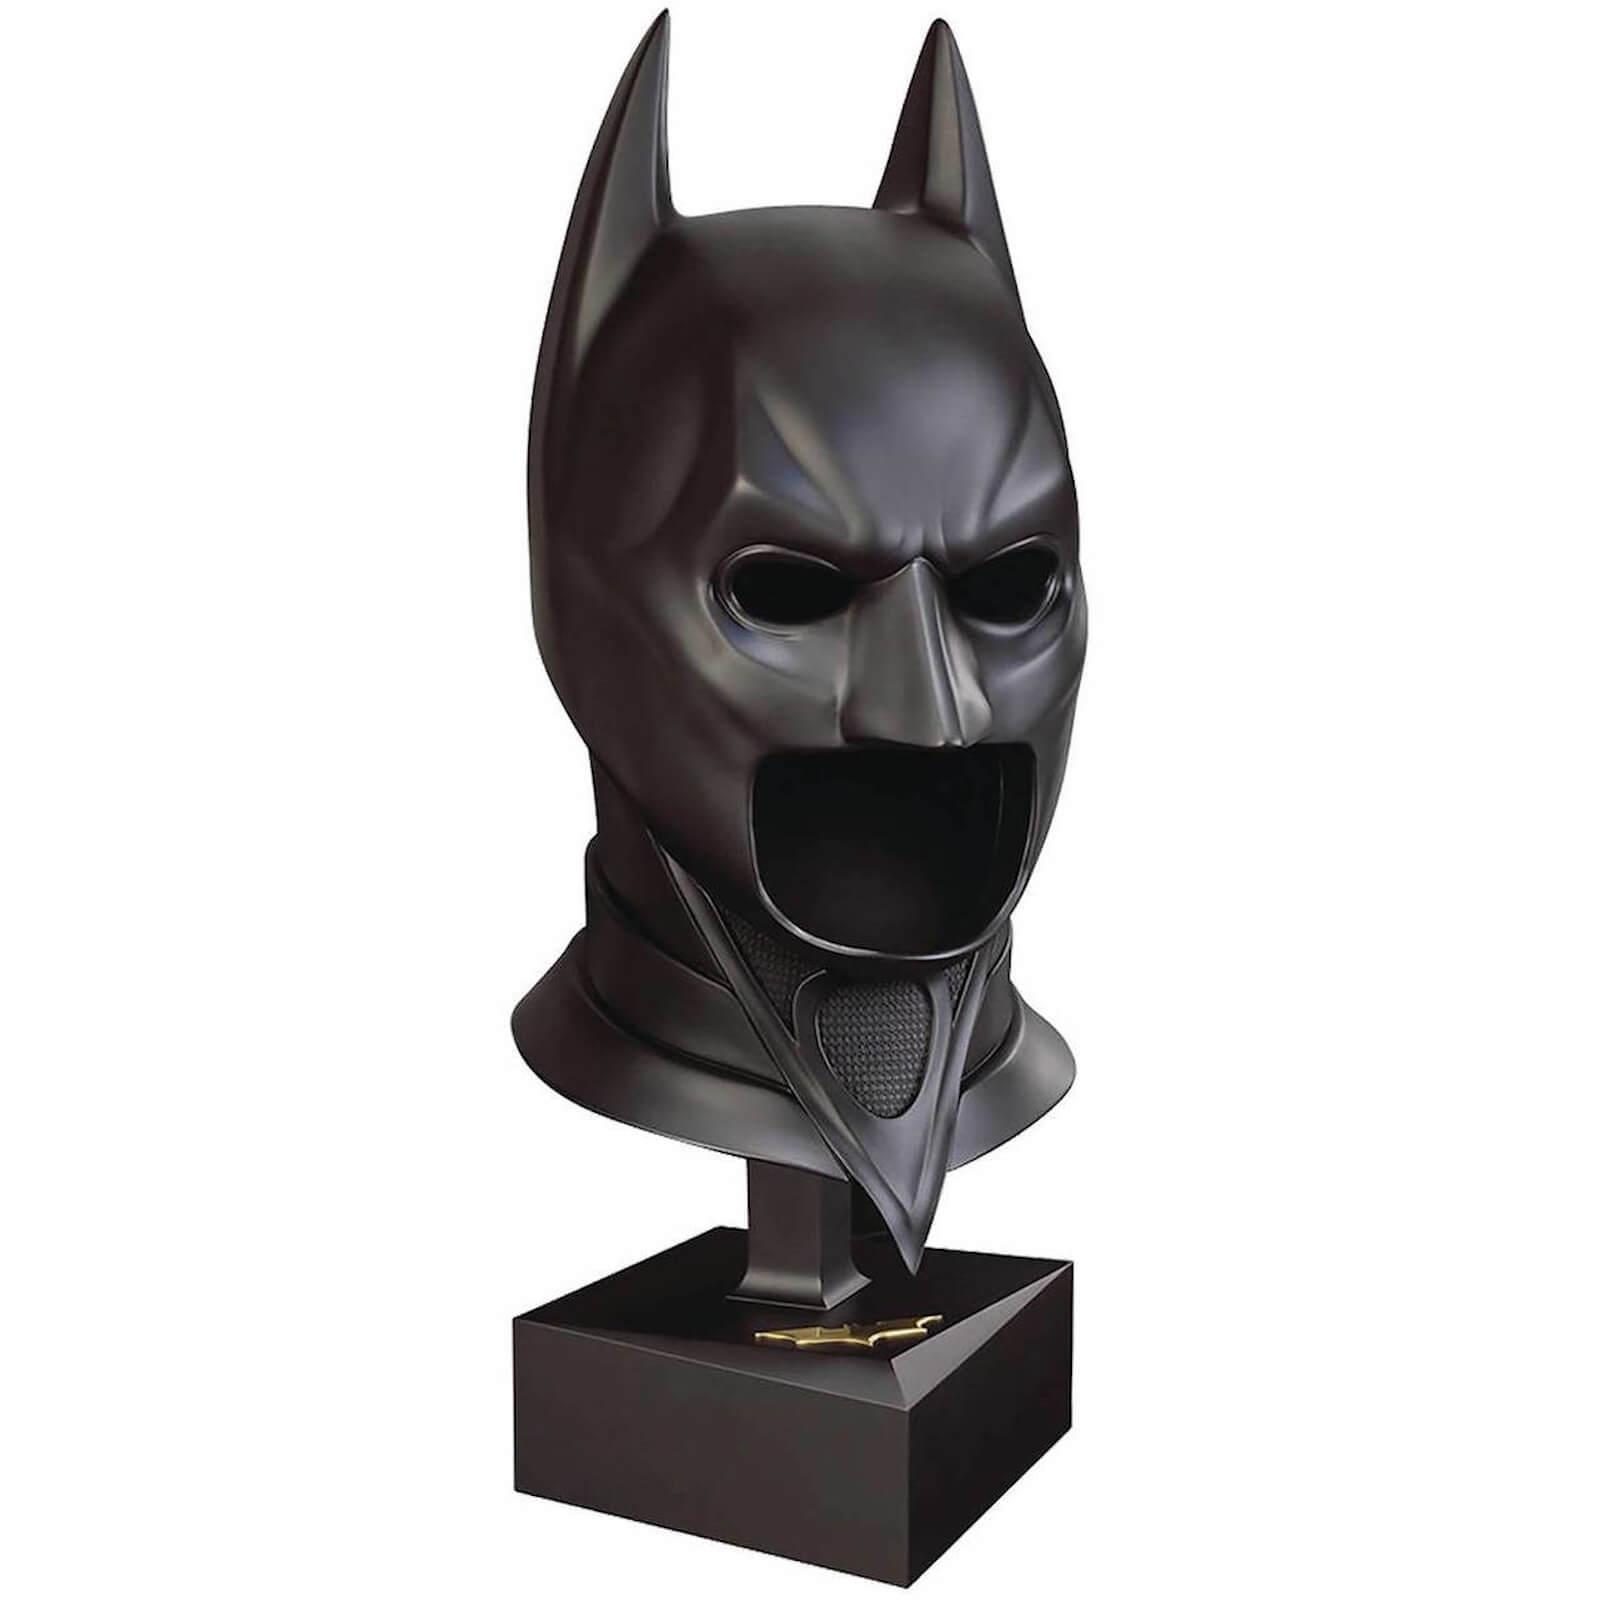 Image of DC Comics Batman Full Size Display Cowl